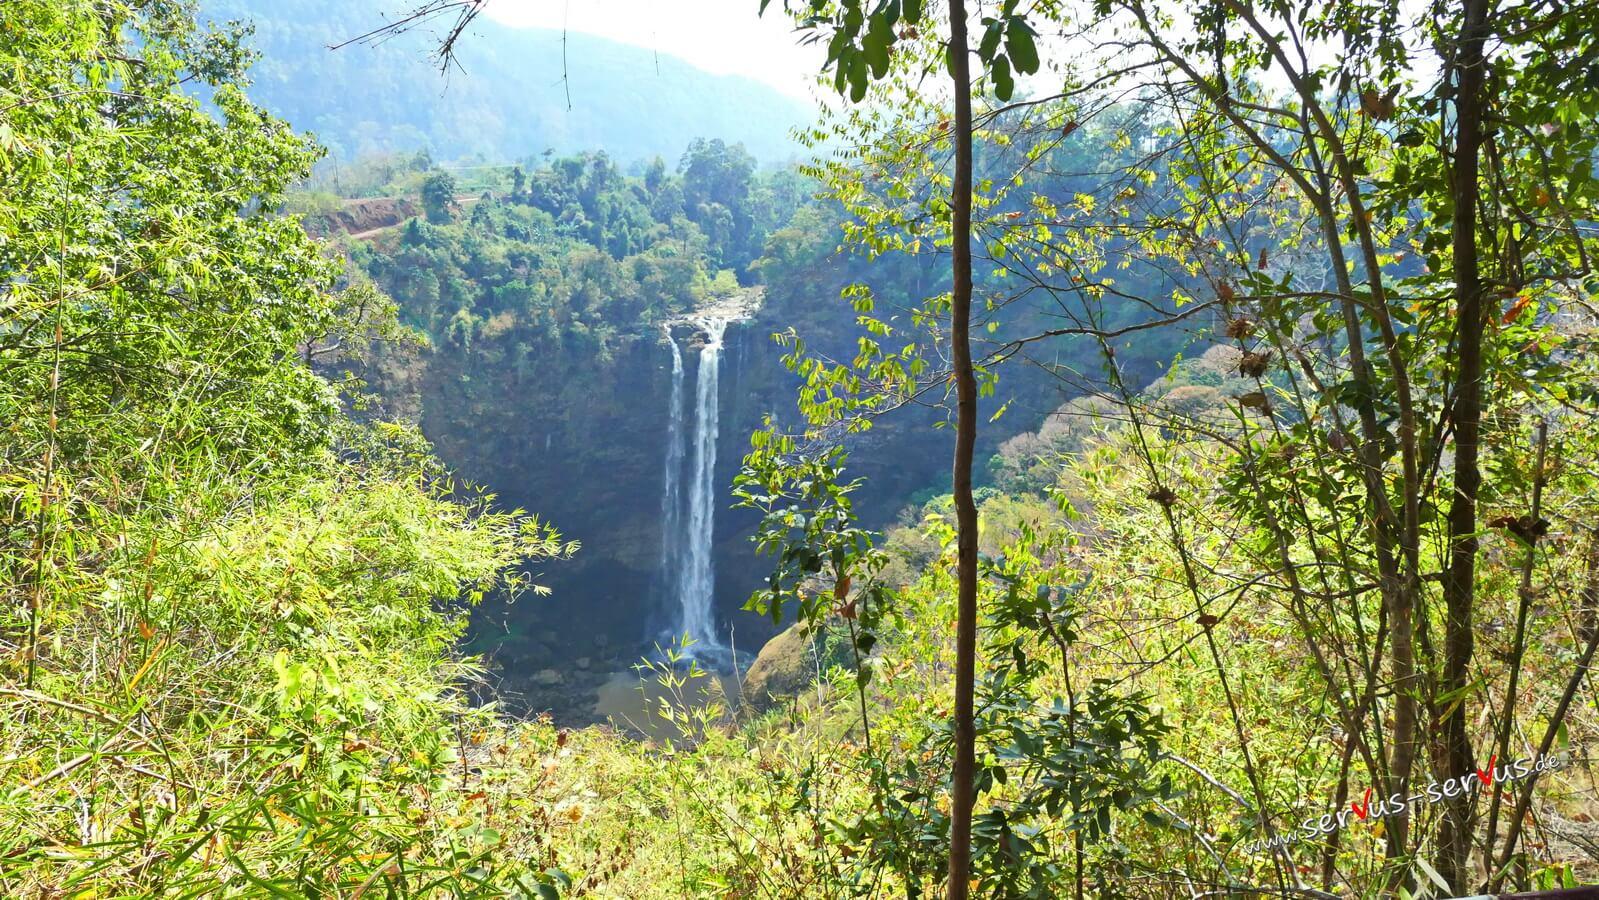 Tad Katamtok, Laos, Wasserfall, Bolavenplateau